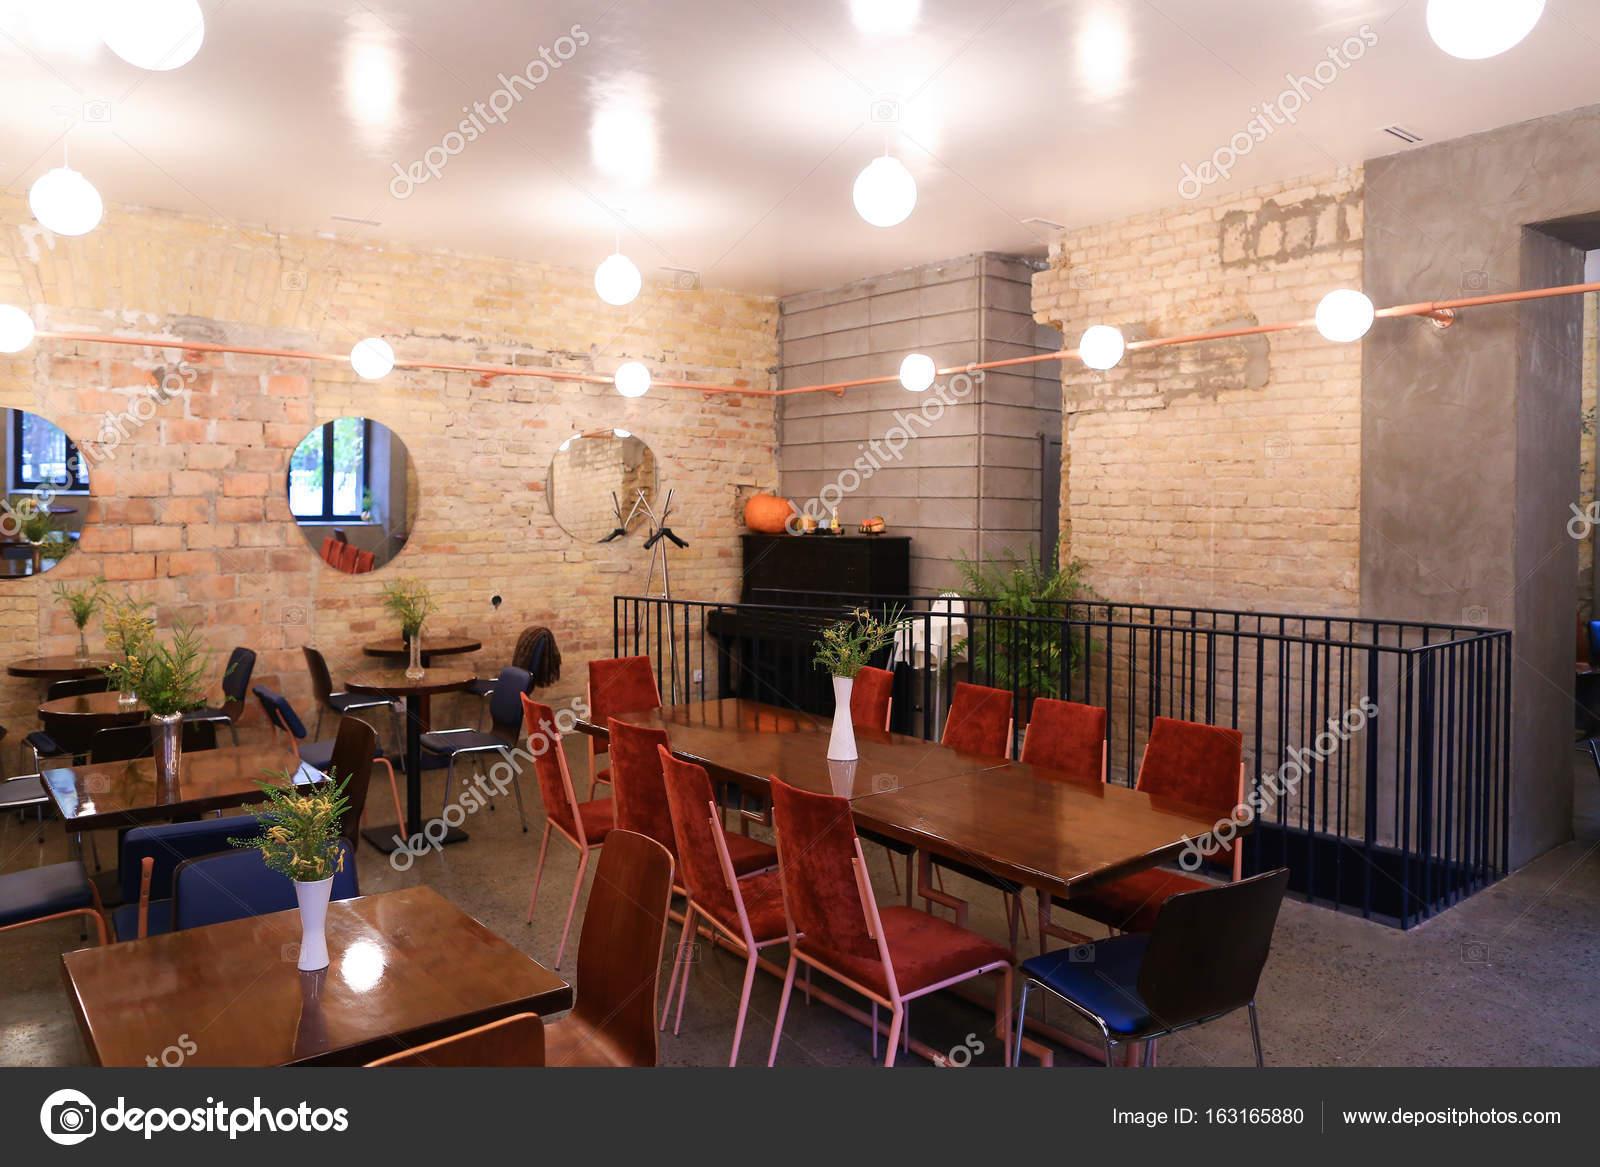 Ideeen Hoge Muur : Ideeen hoge muur cool ideeen hoge muur moderne huizen